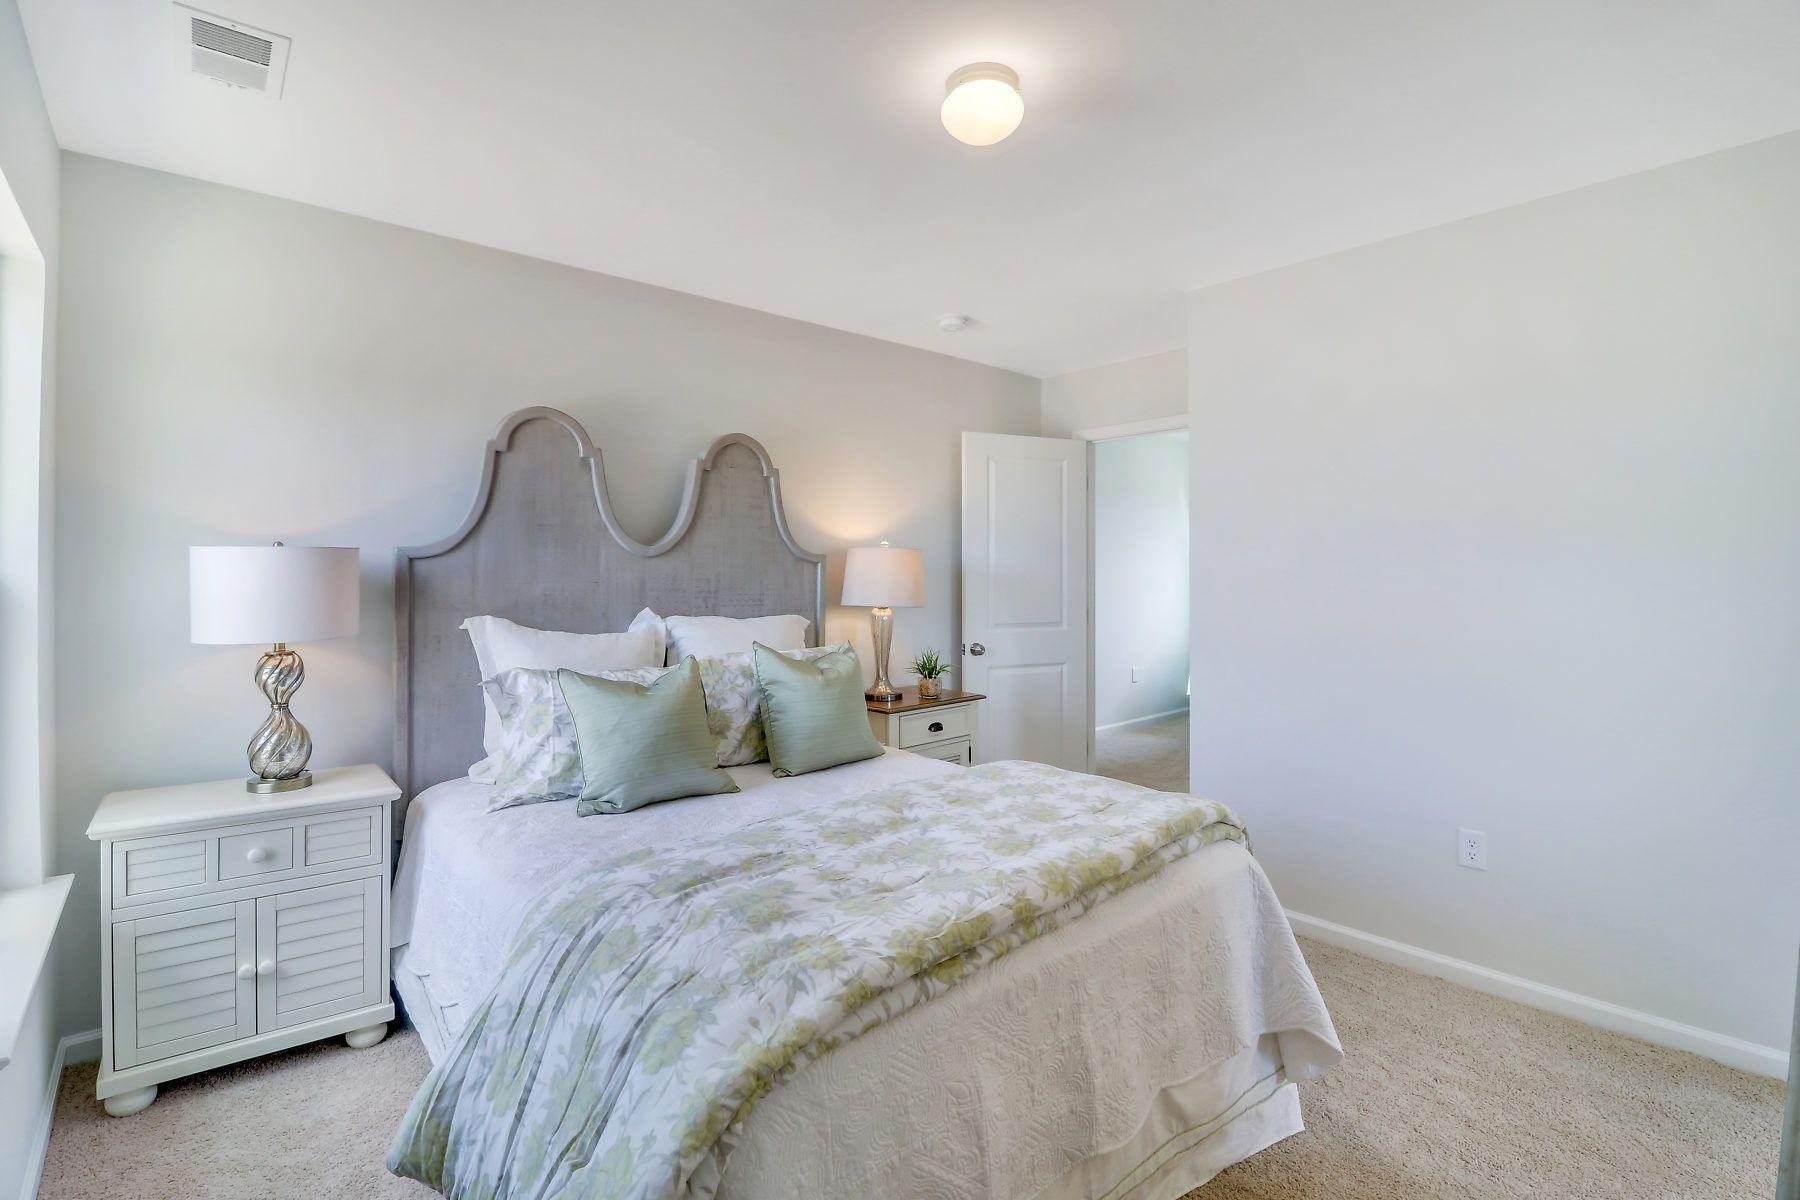 Bedroom featured in The Crawford II By Village Park Homes in Savannah, SC